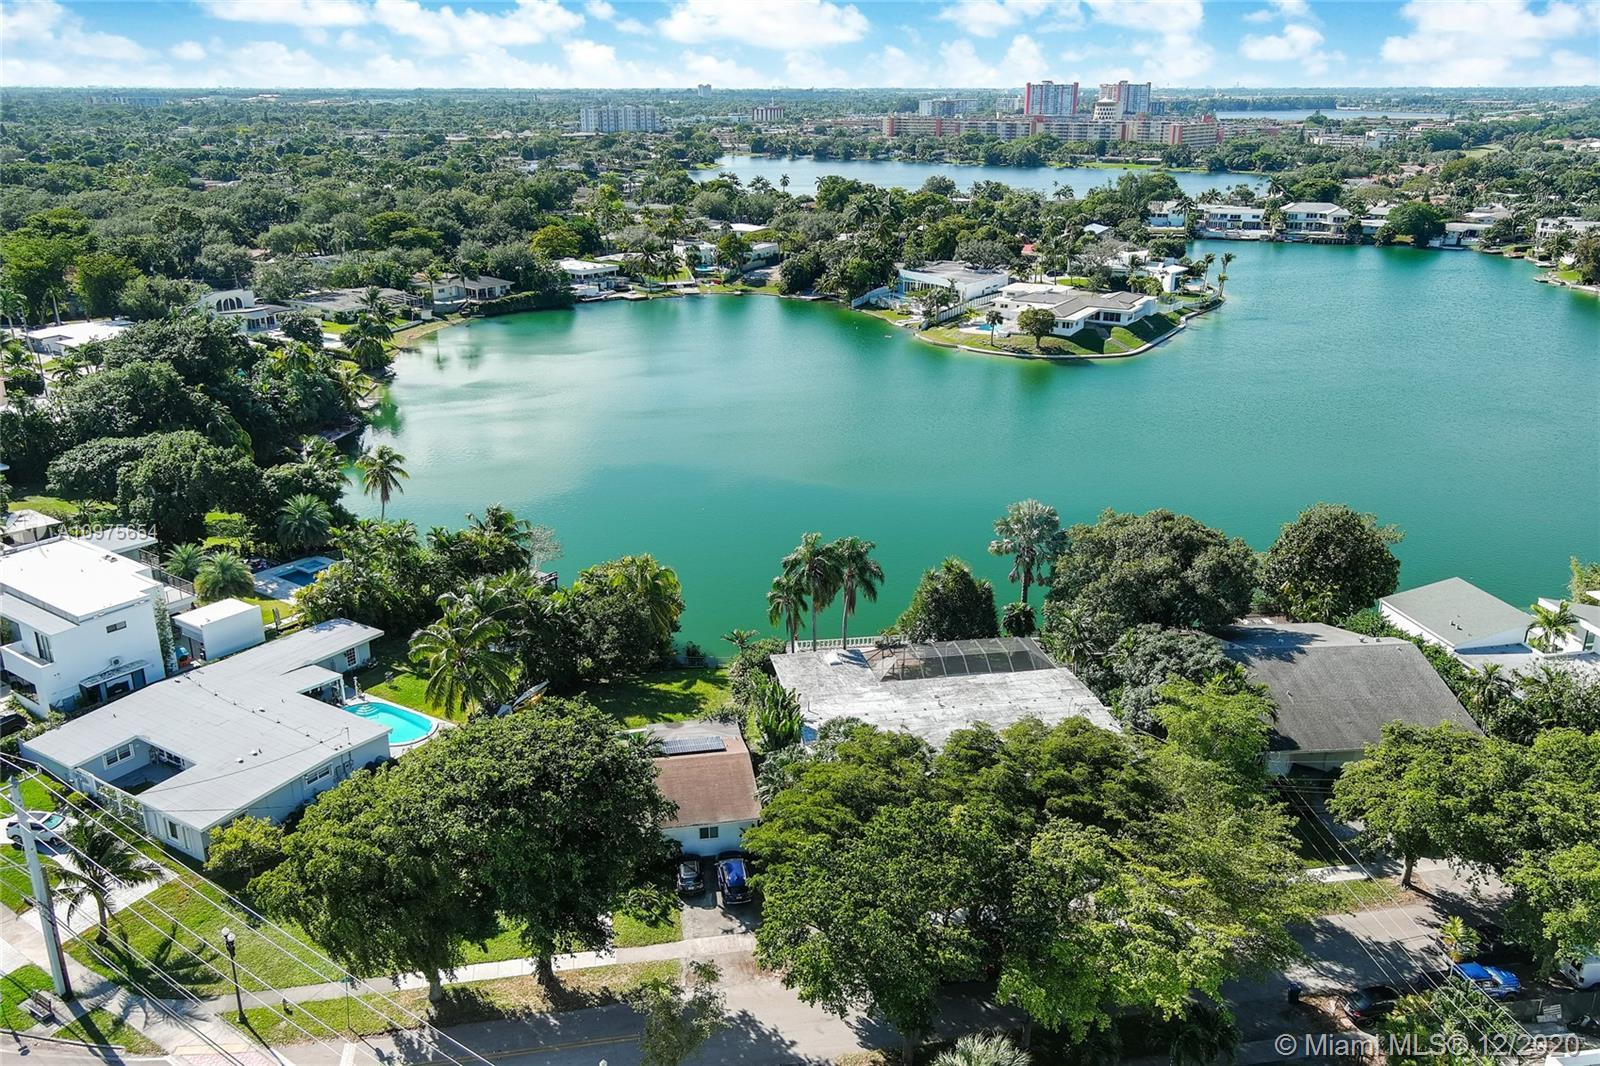 Sky Lake - 19360 NE 22nd Rd, North Miami Beach, FL 33179